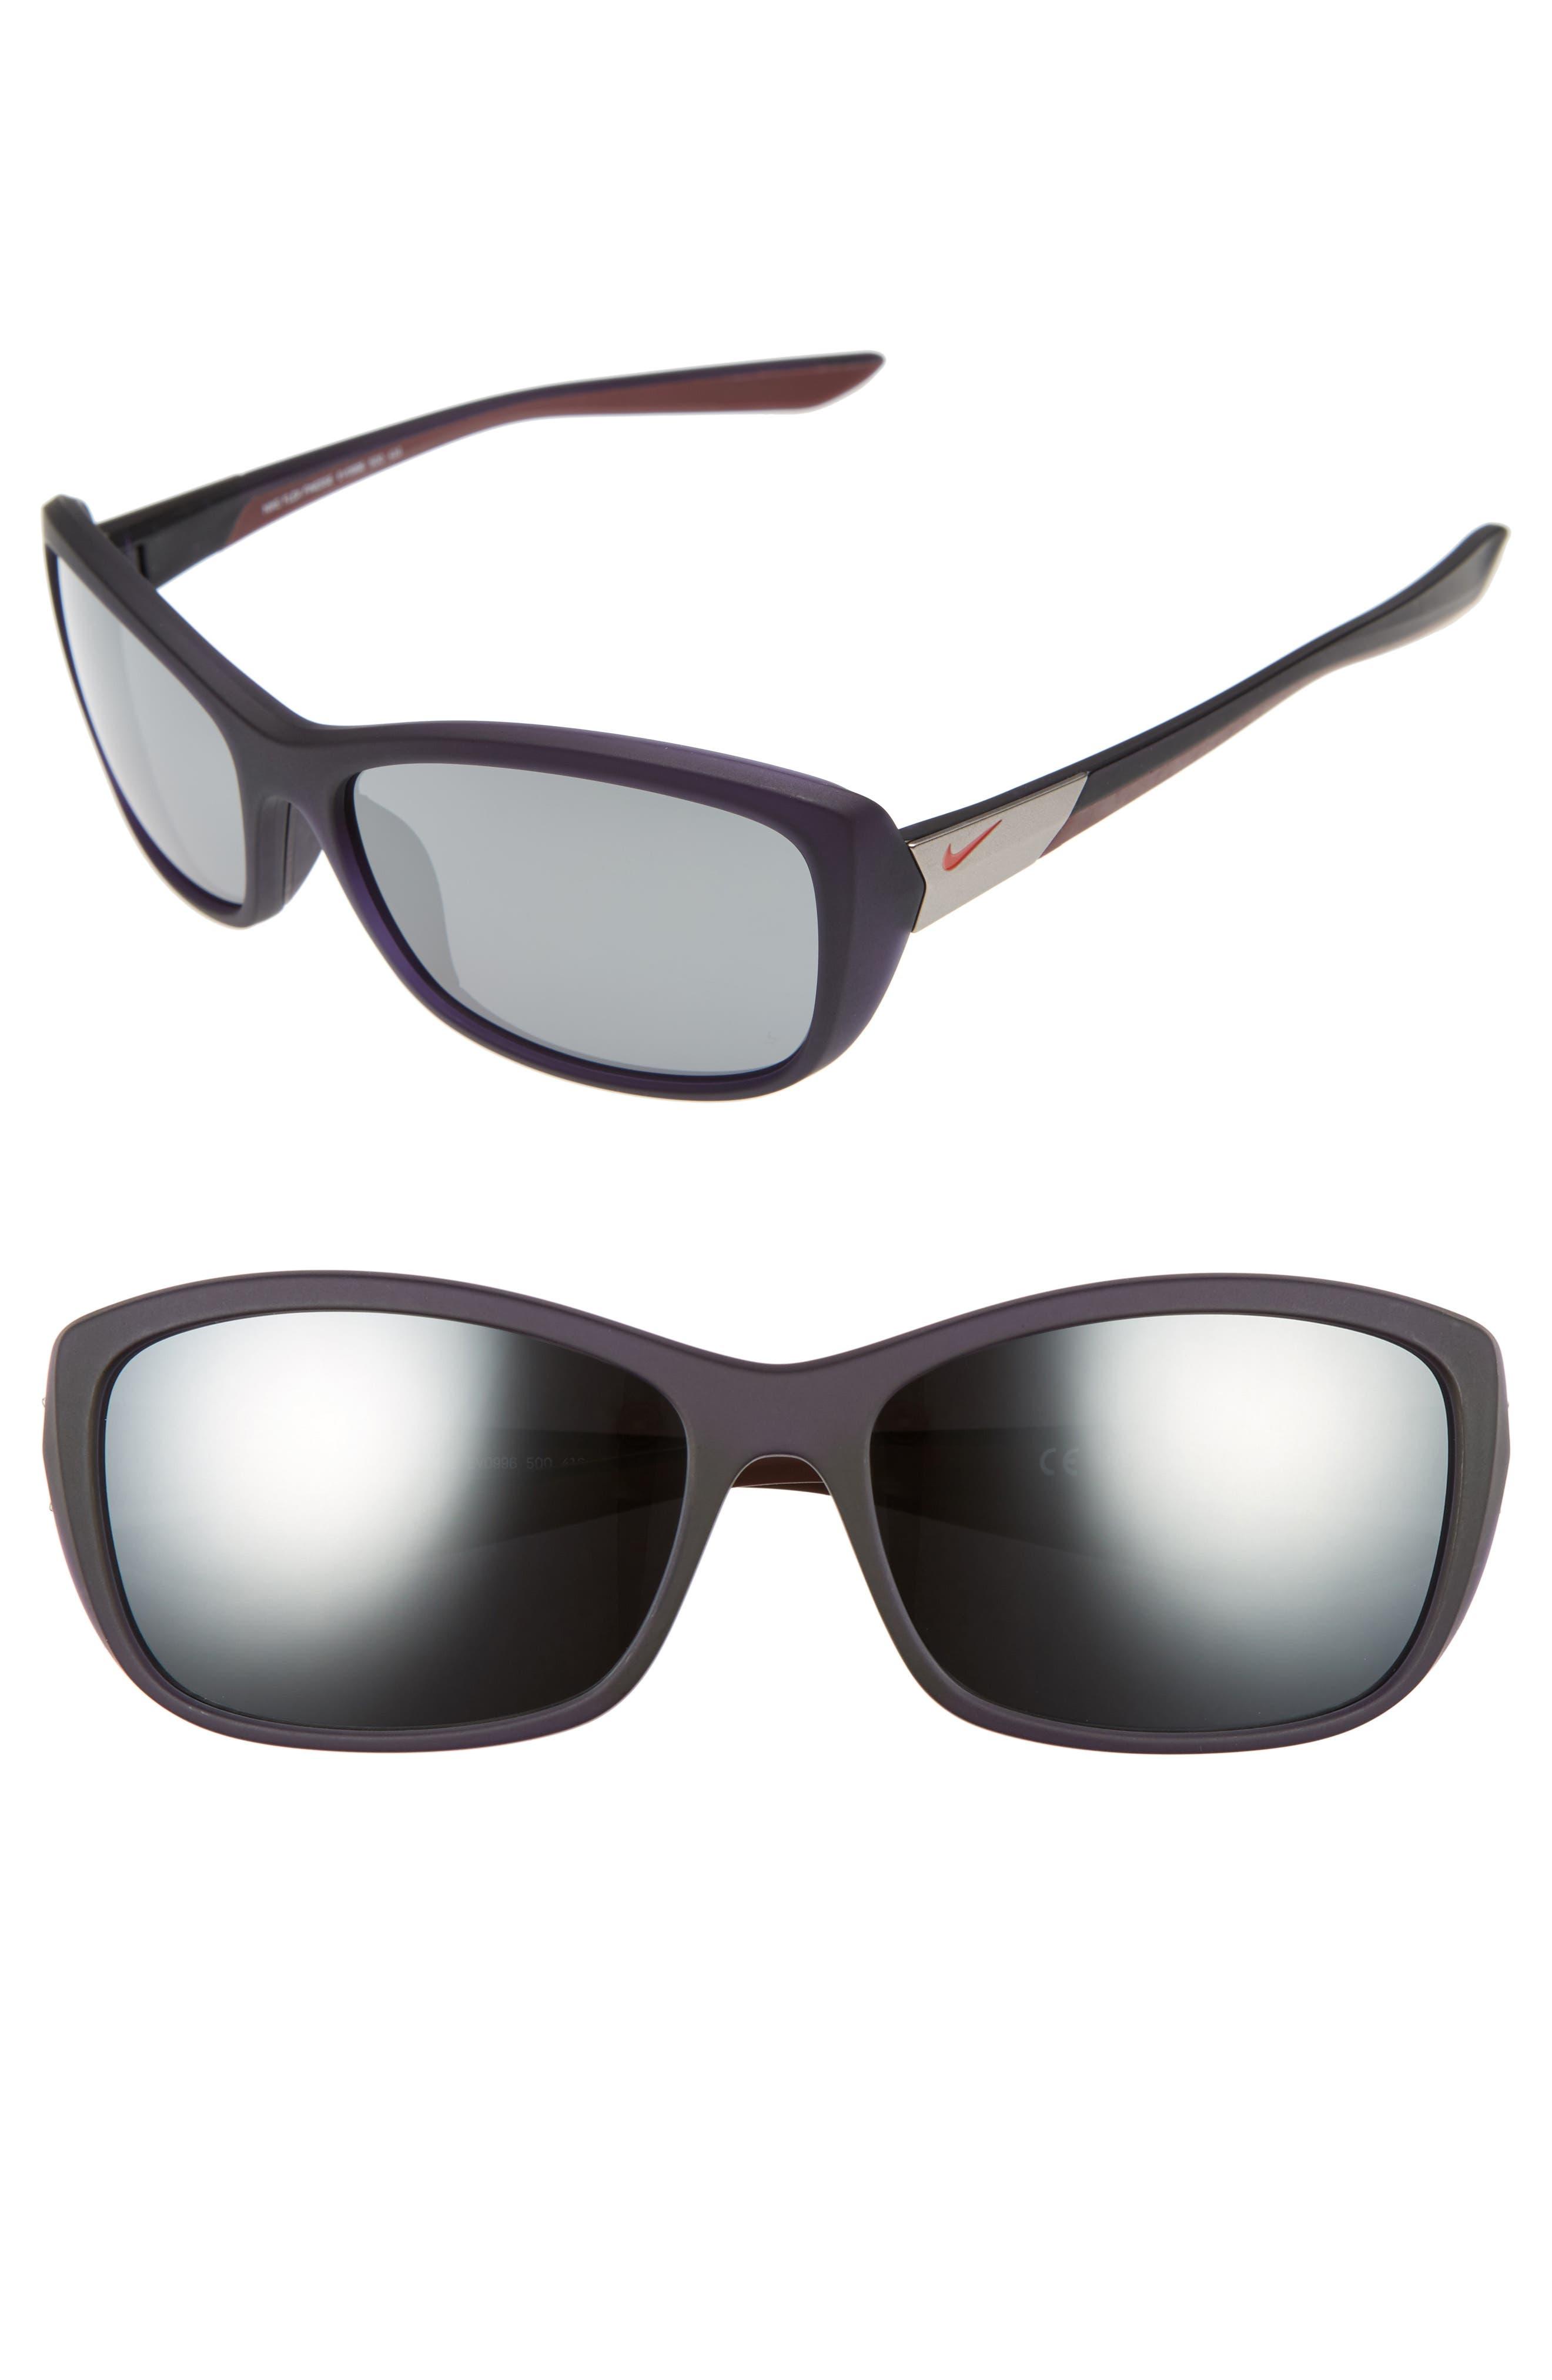 nike sunglasses womens black